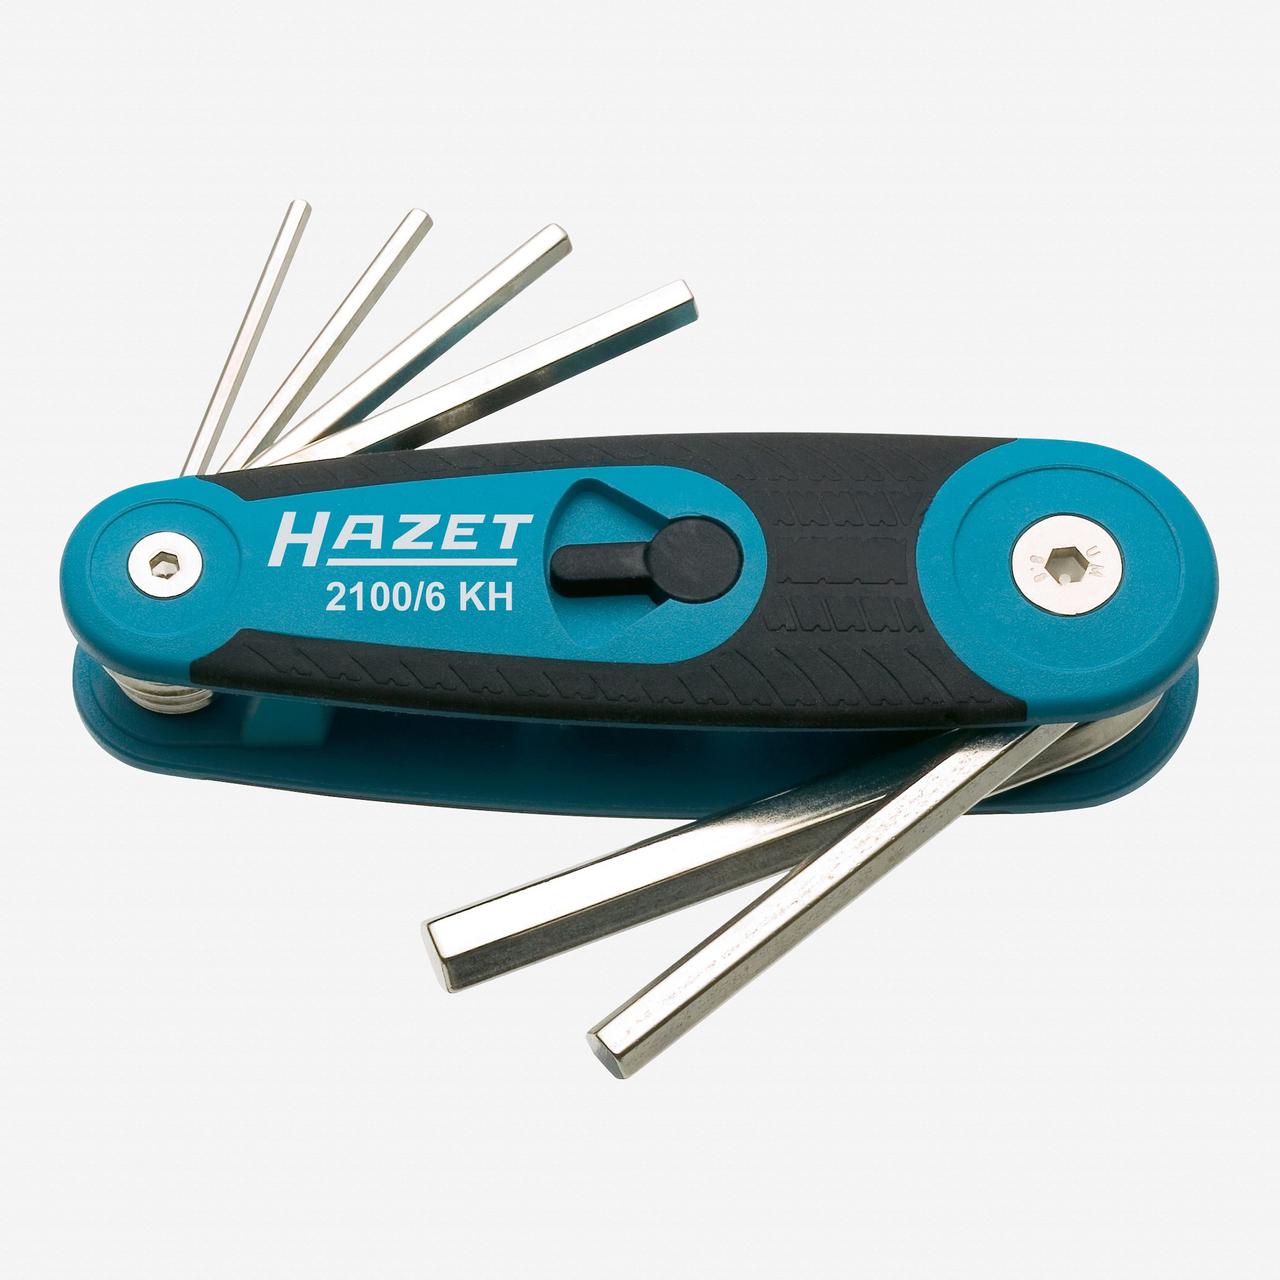 Hazet 2100/6 KH  Hex Metric L-key Fold Up Set 2.5 - 8mm - KC Tool